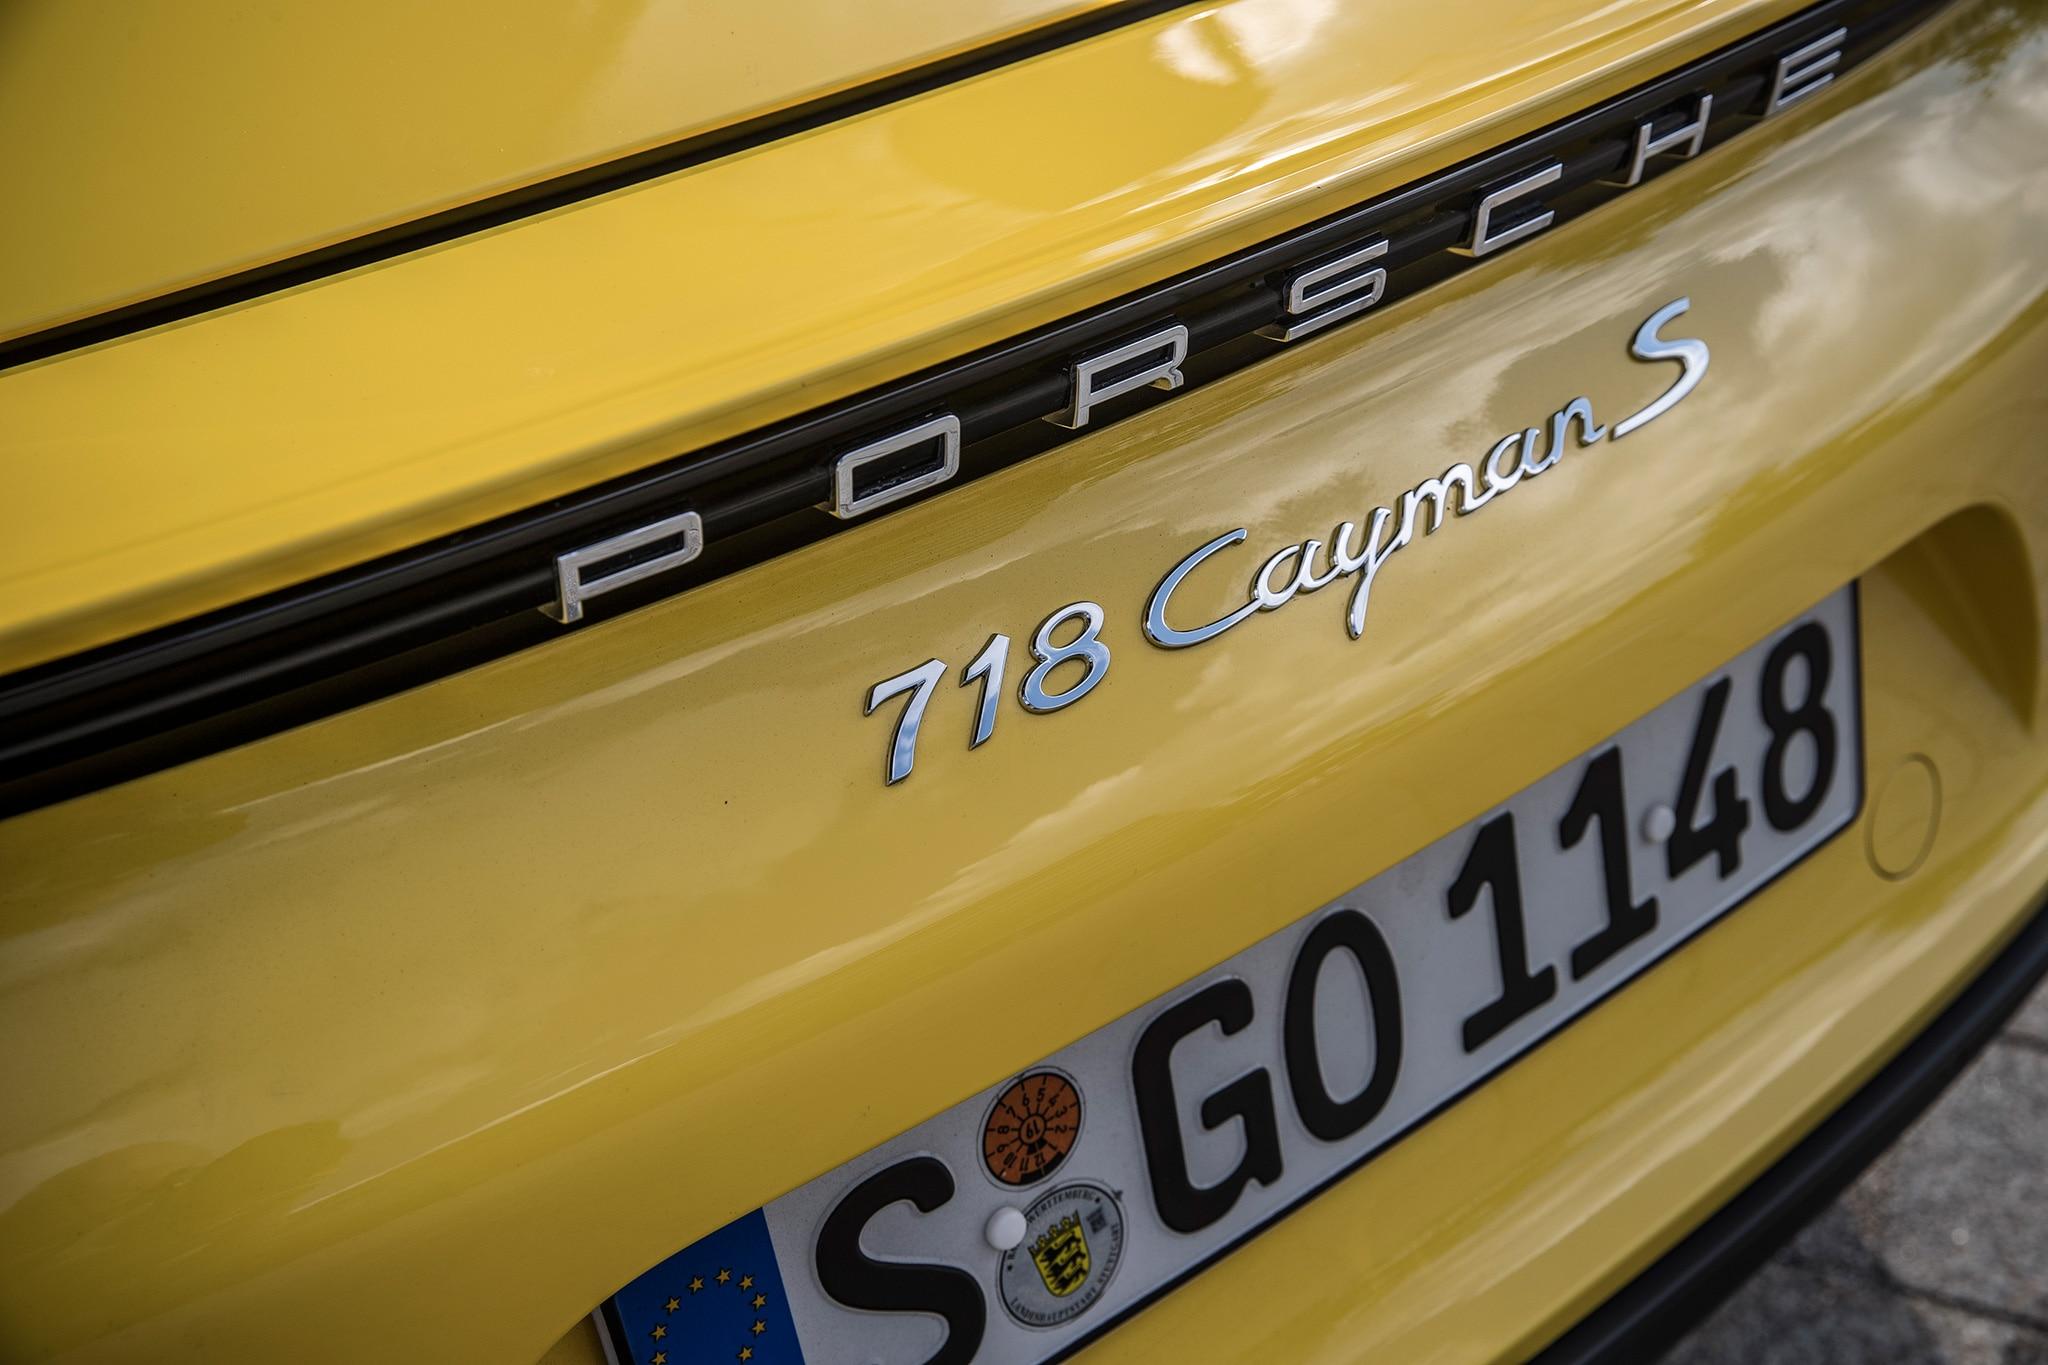 2017 Porsche Cayman S Badge